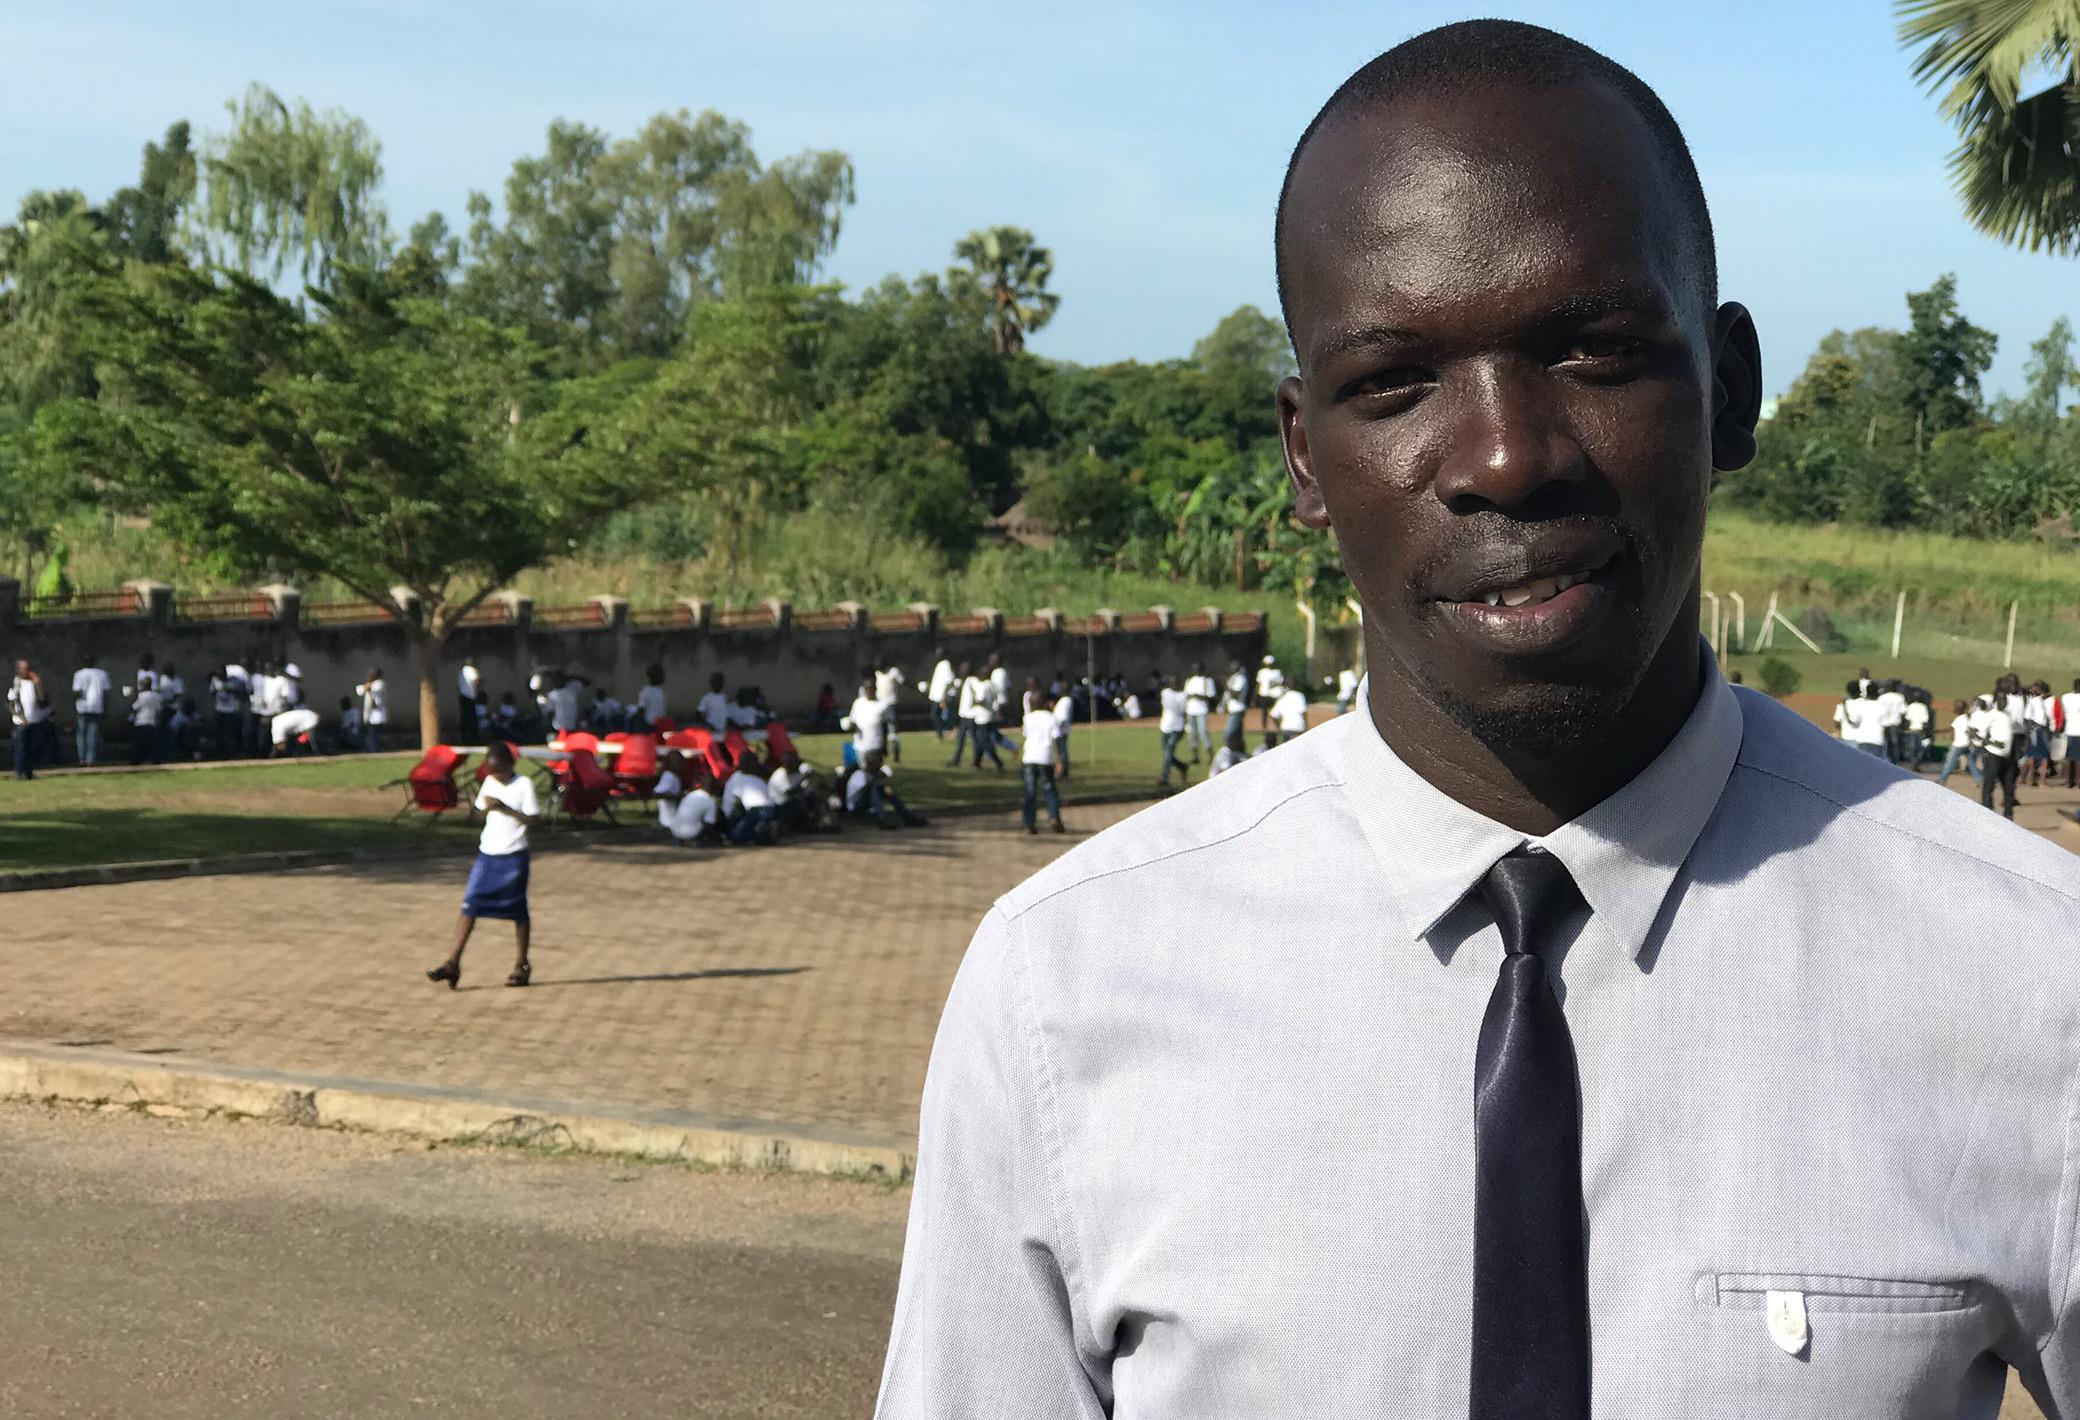 Mr Samuel Woko, Principal at Ludia Nursery and Primary School, Gulu. Photo: Vibeke Quaade